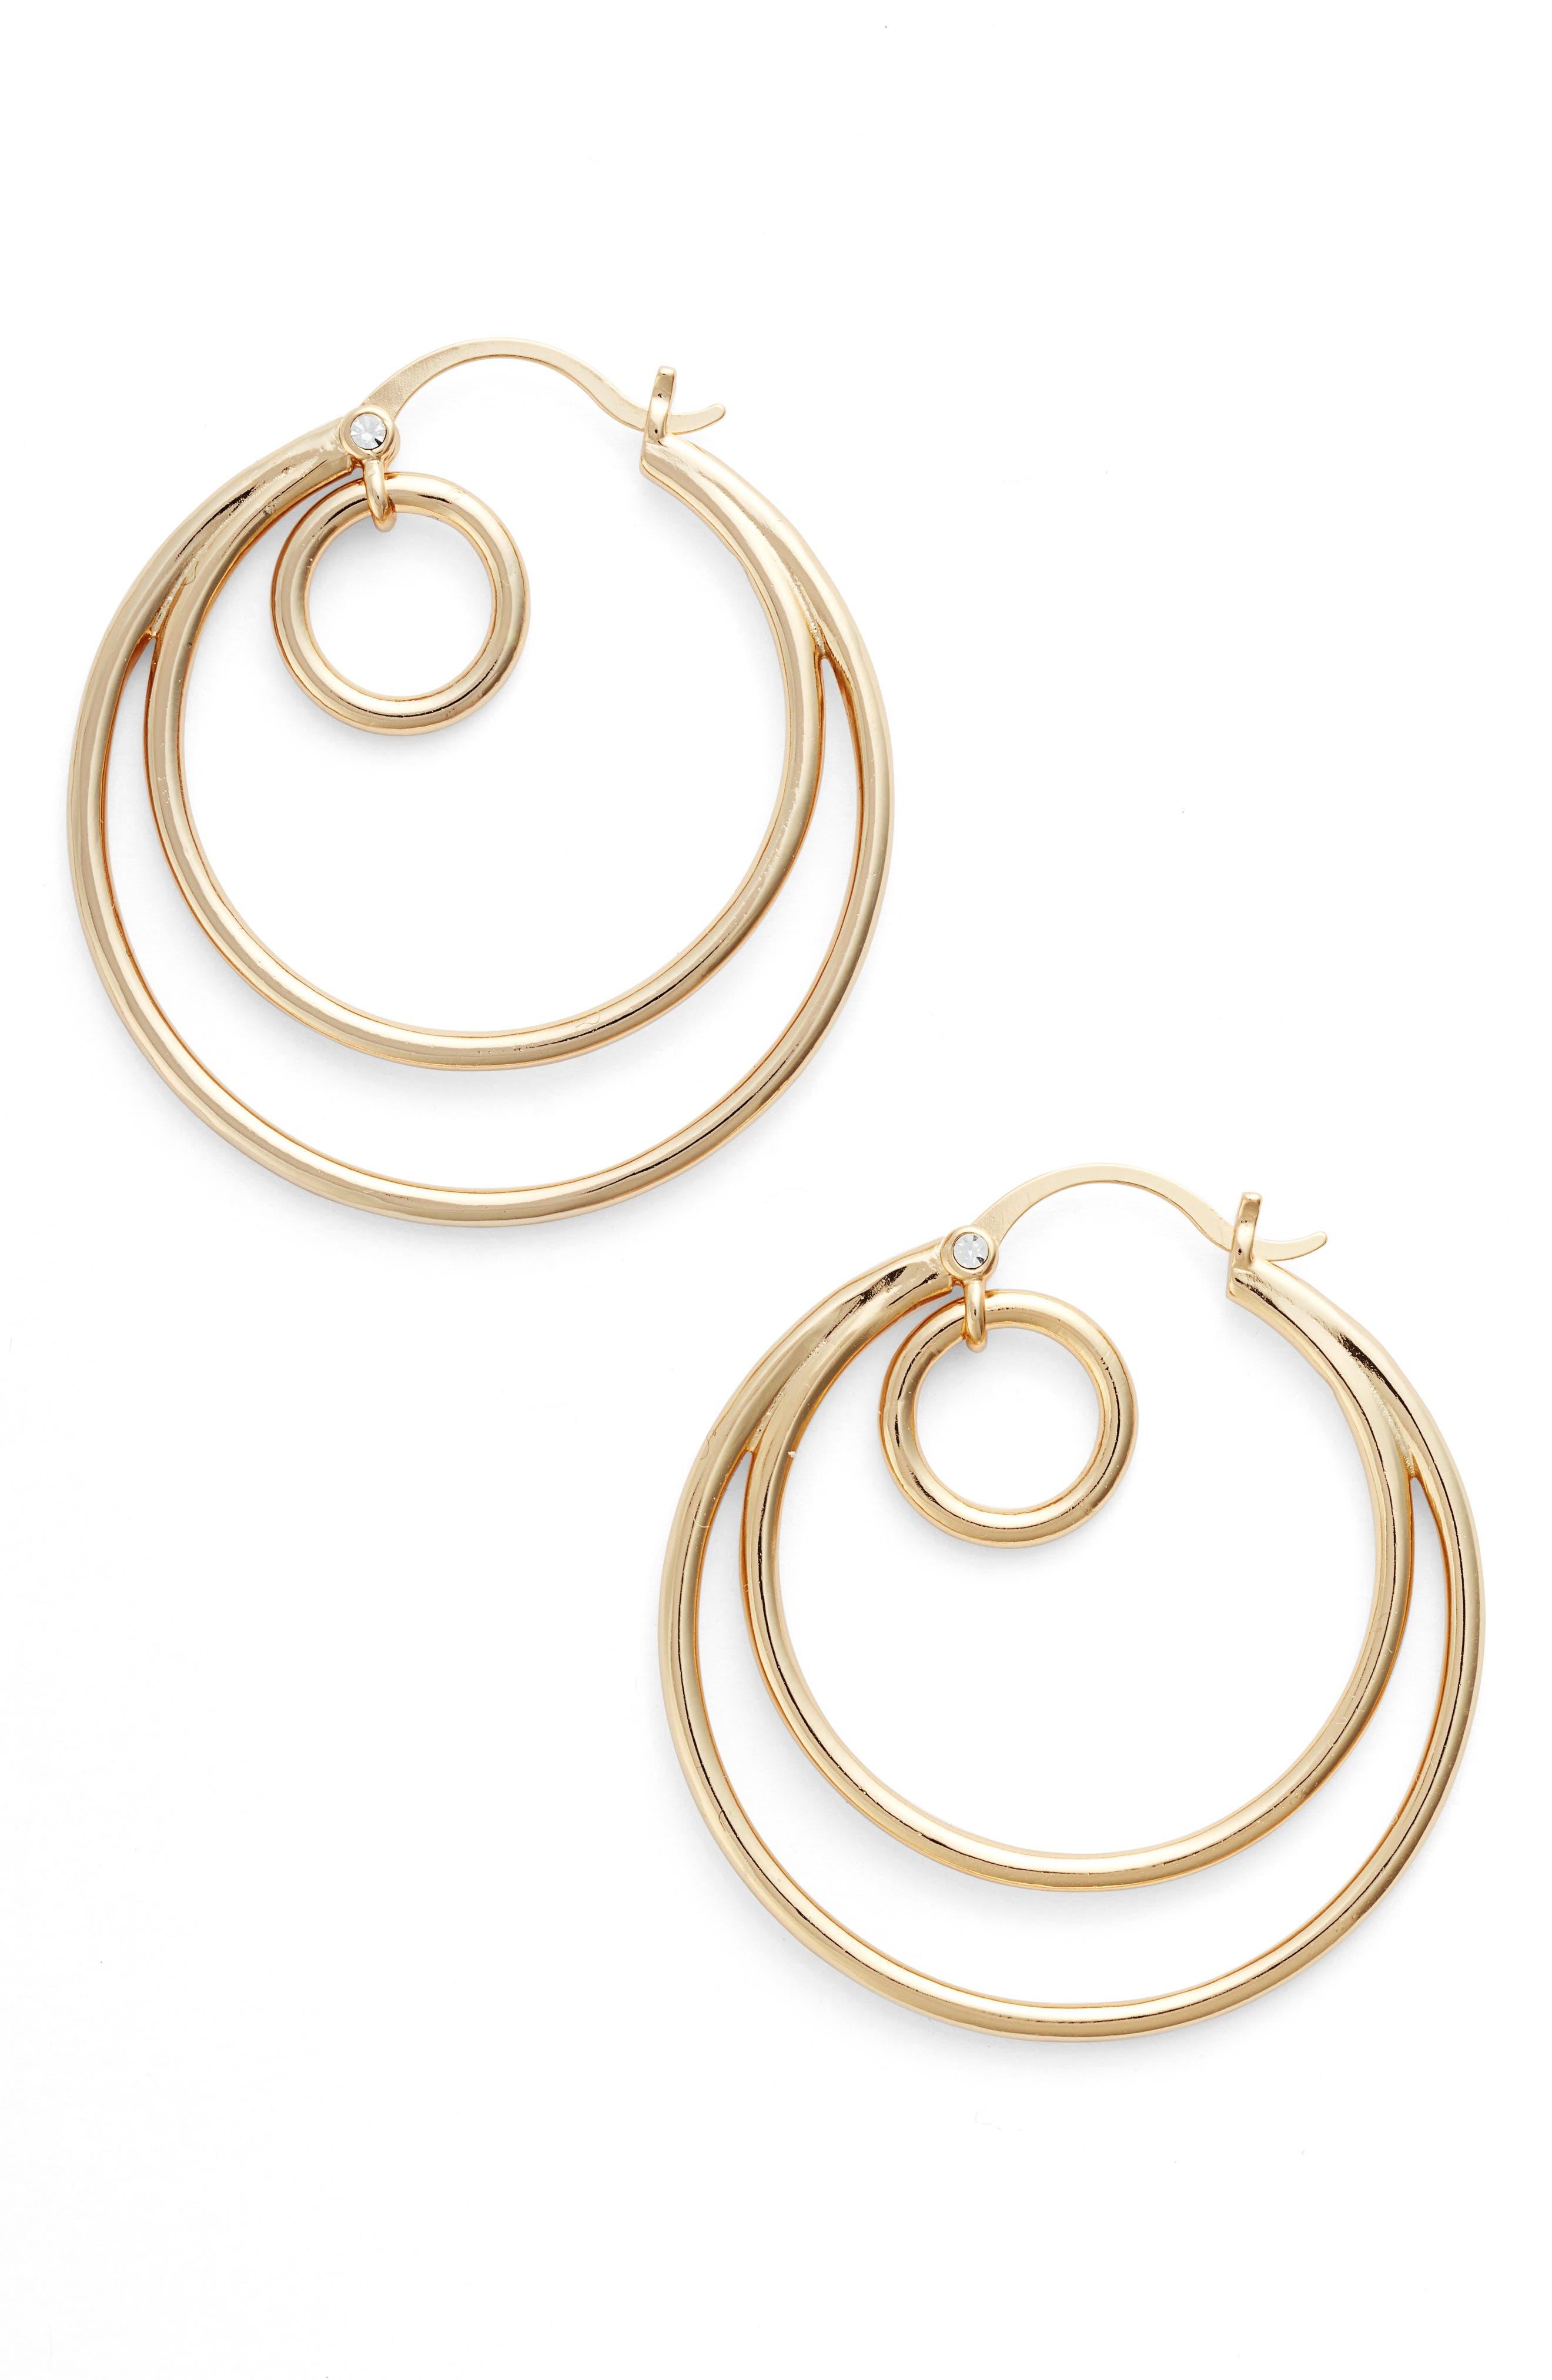 Galaxy Hoop Earrings,                             Main thumbnail 1, color,                             710